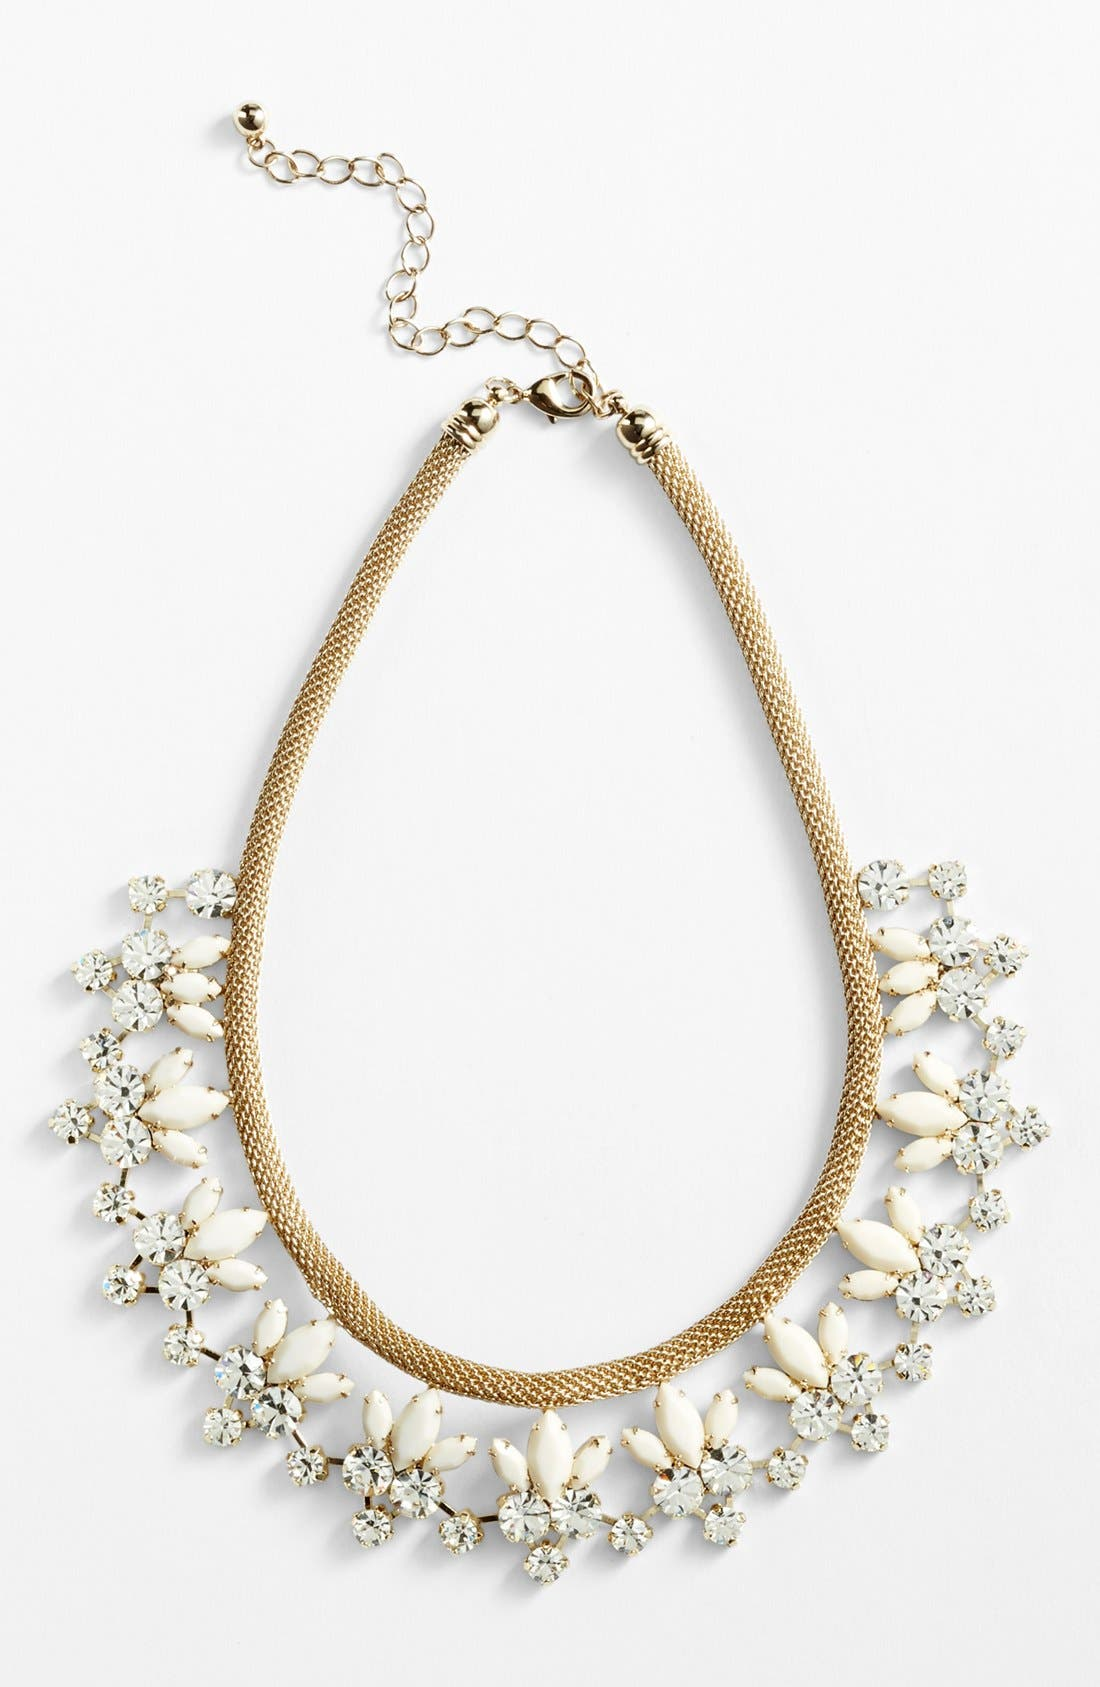 Main Image - Natasha Couture Floral Statement Necklace